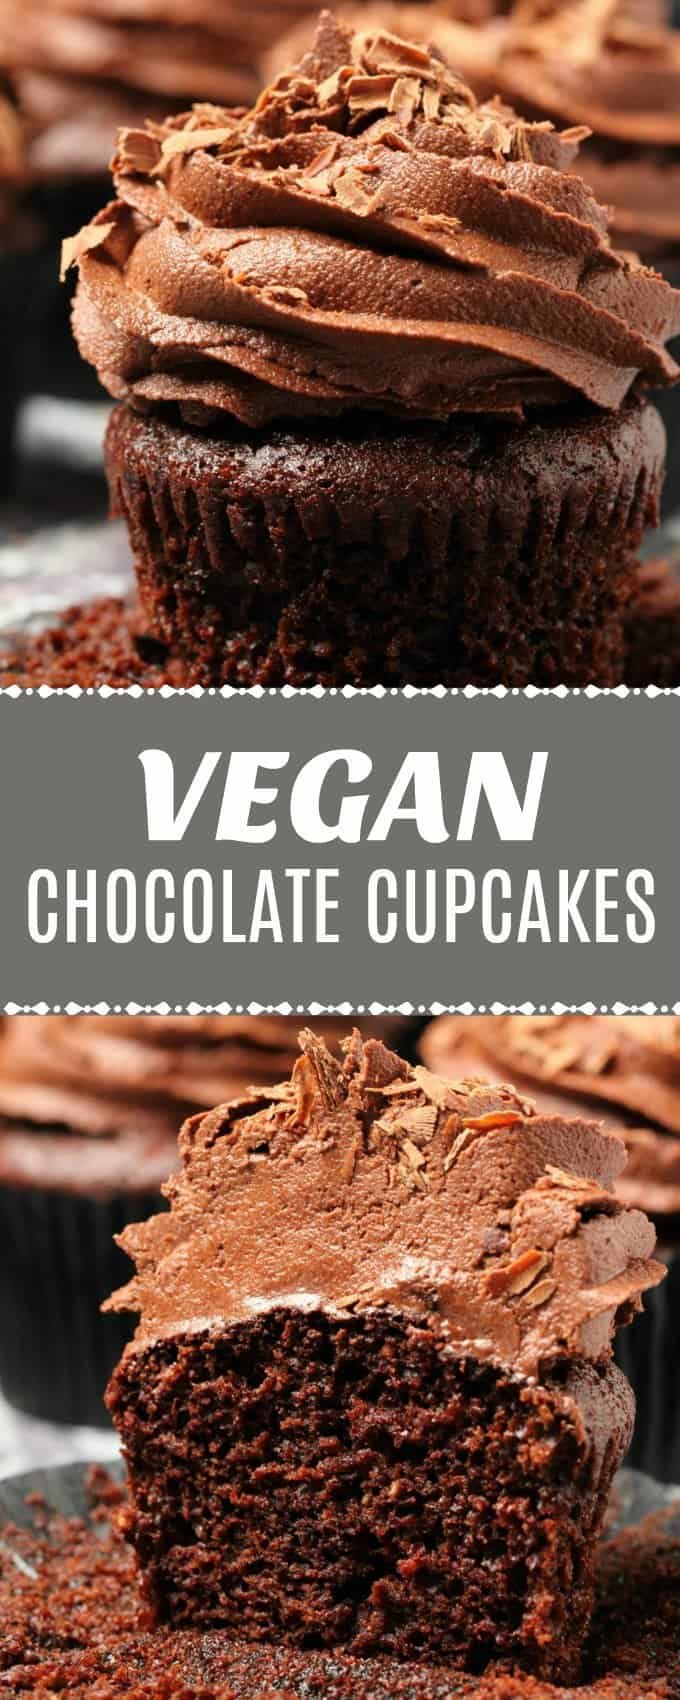 Classic vegan chocolate cupcakes topped with the smoothest, silkiest vegan chocolate buttercream and chocolate shavings. Moist, fluffy and mega-chocolatey. The perfect vegan chocolate cupcake recipe.   lovingitvegan.com